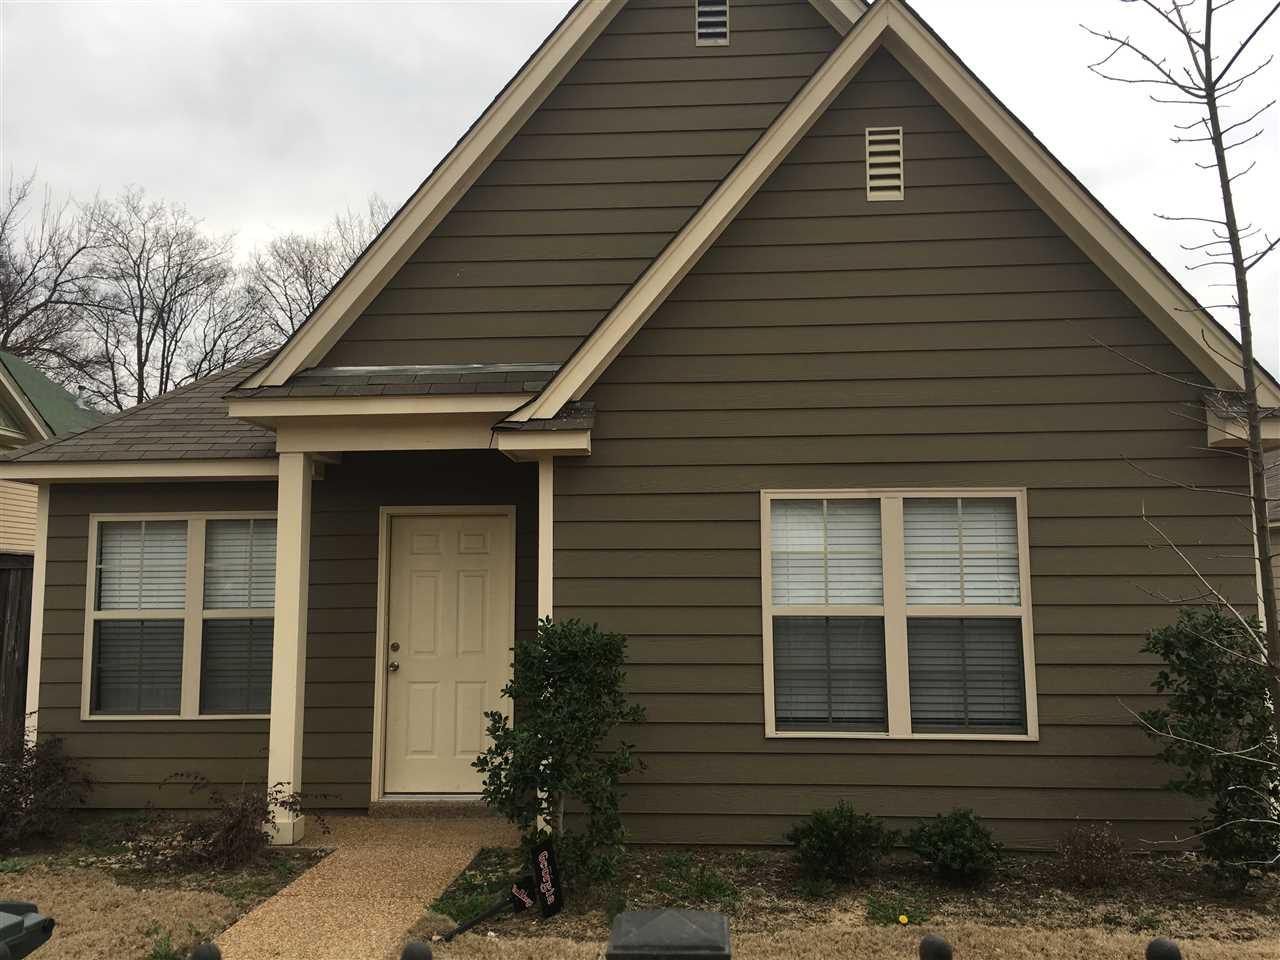 302 N CLAYBROOK ST, Memphis, TN 38104